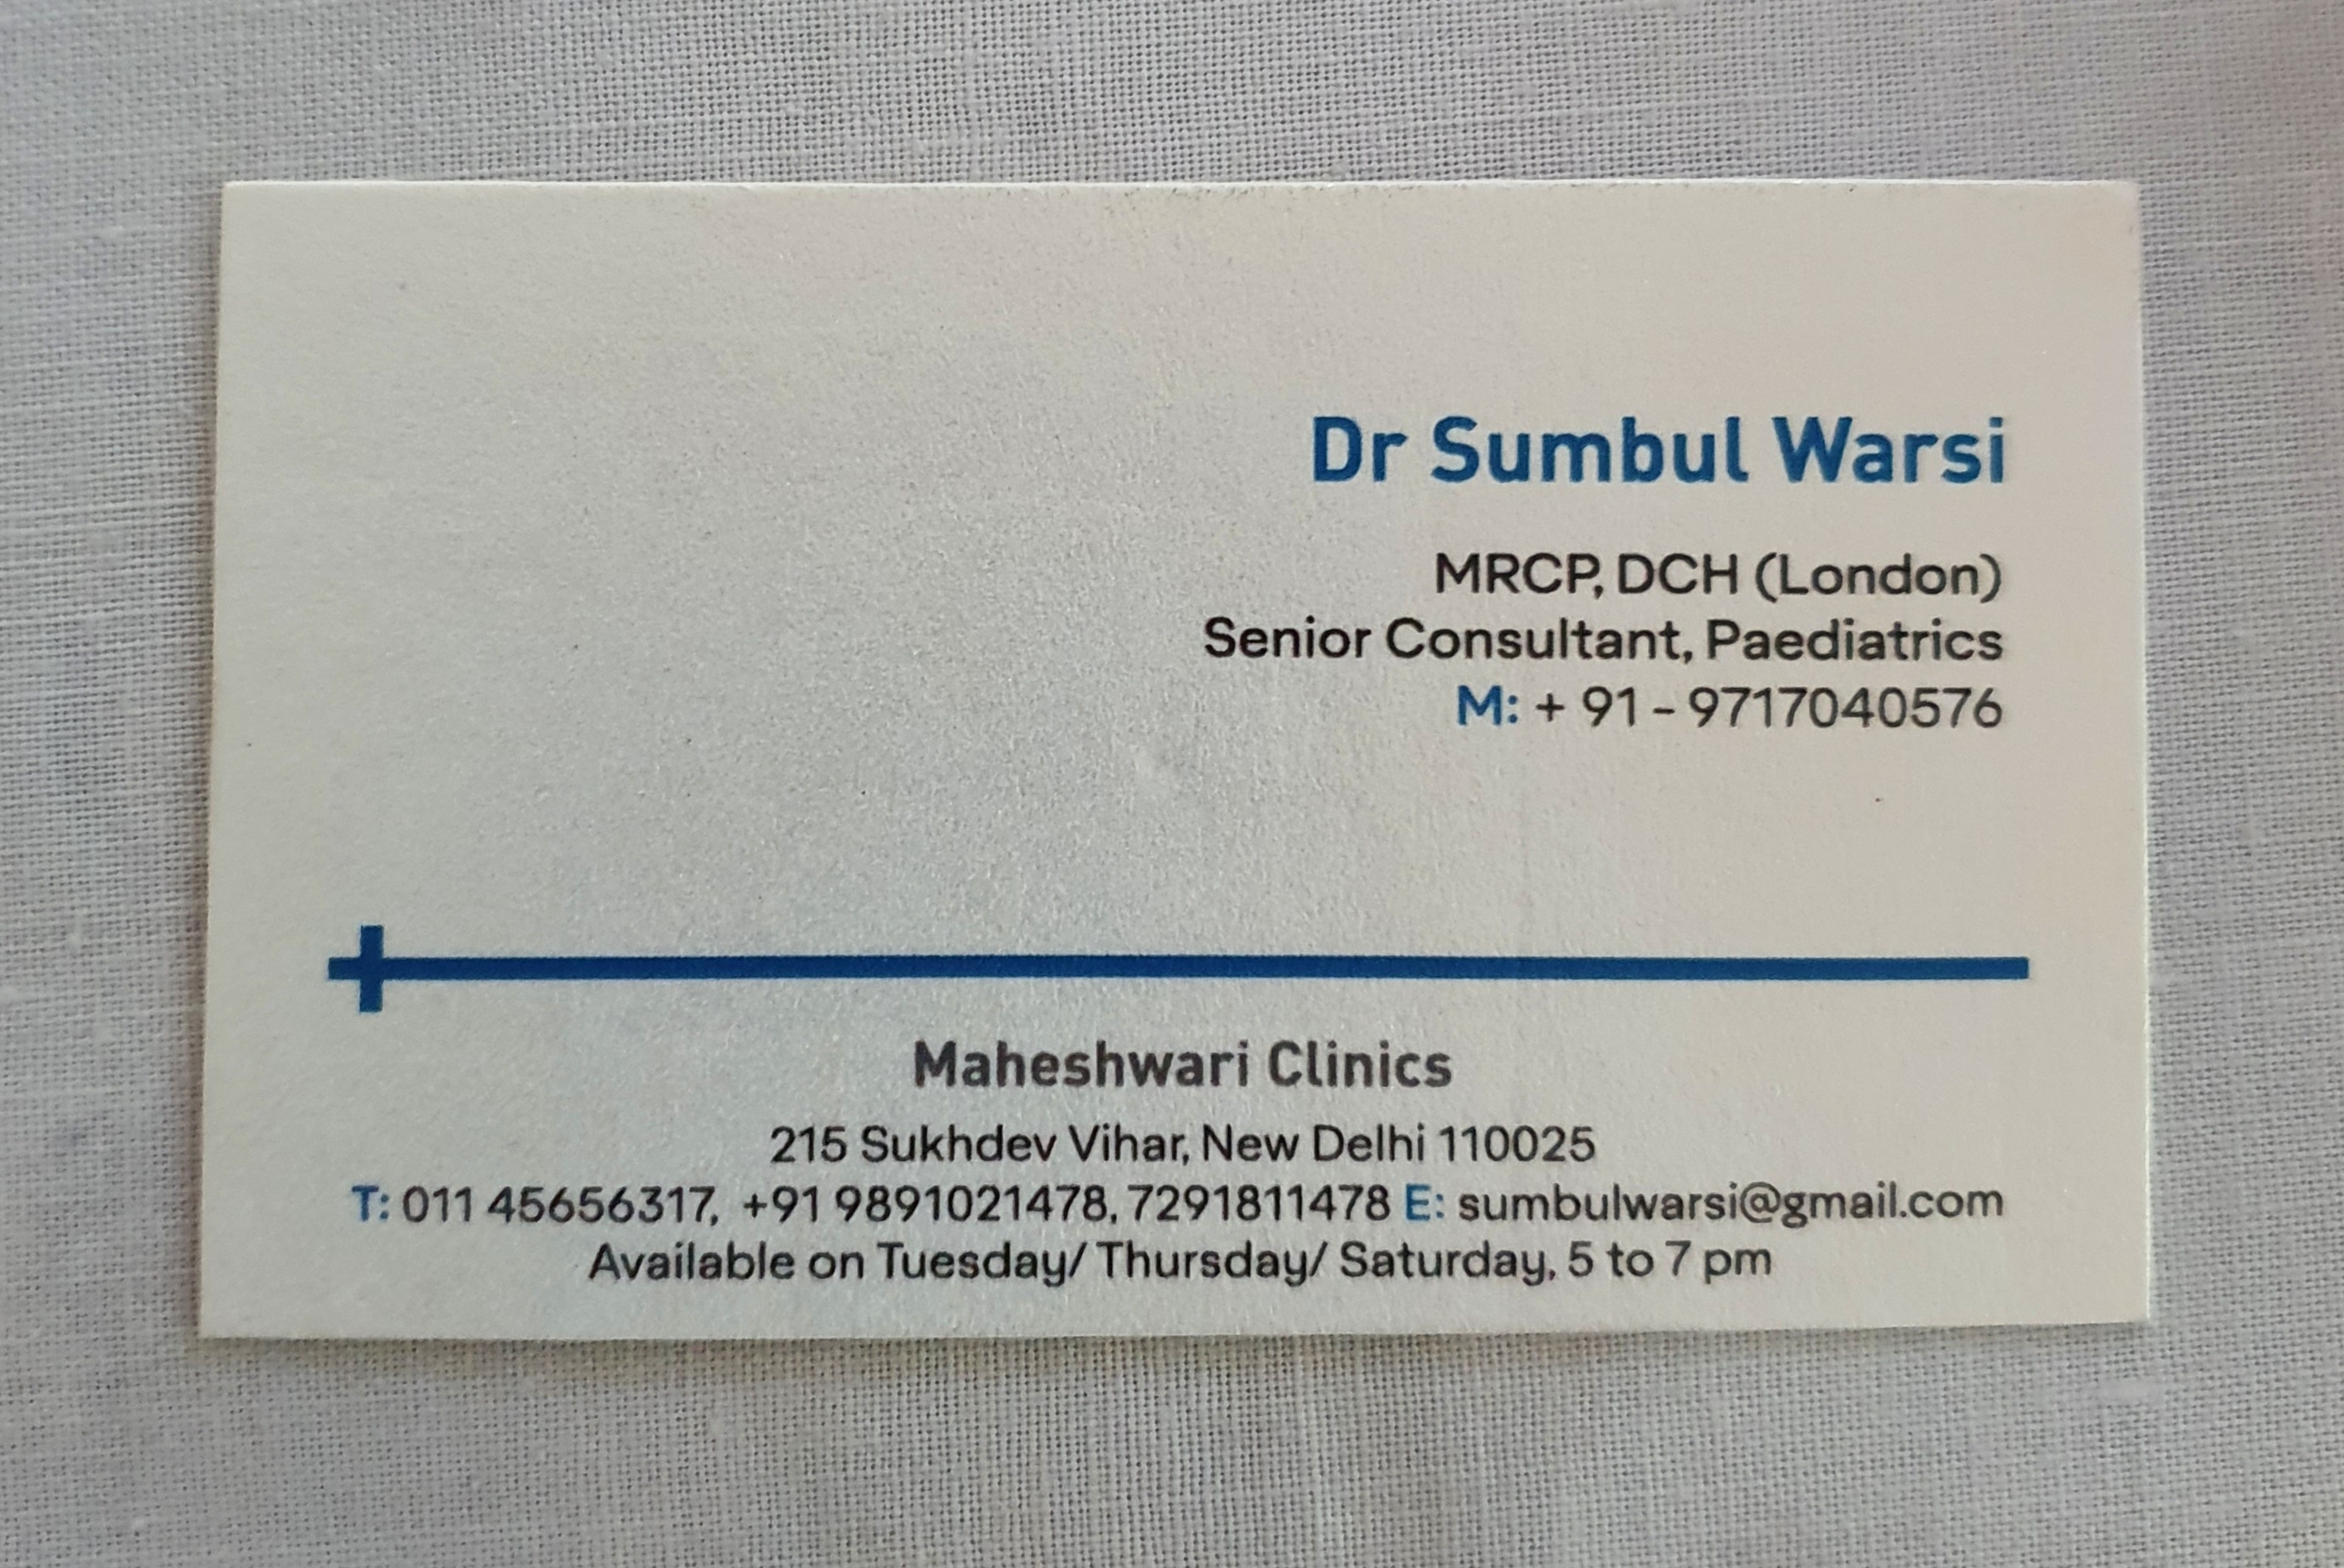 Dr. Sumbul Warsi